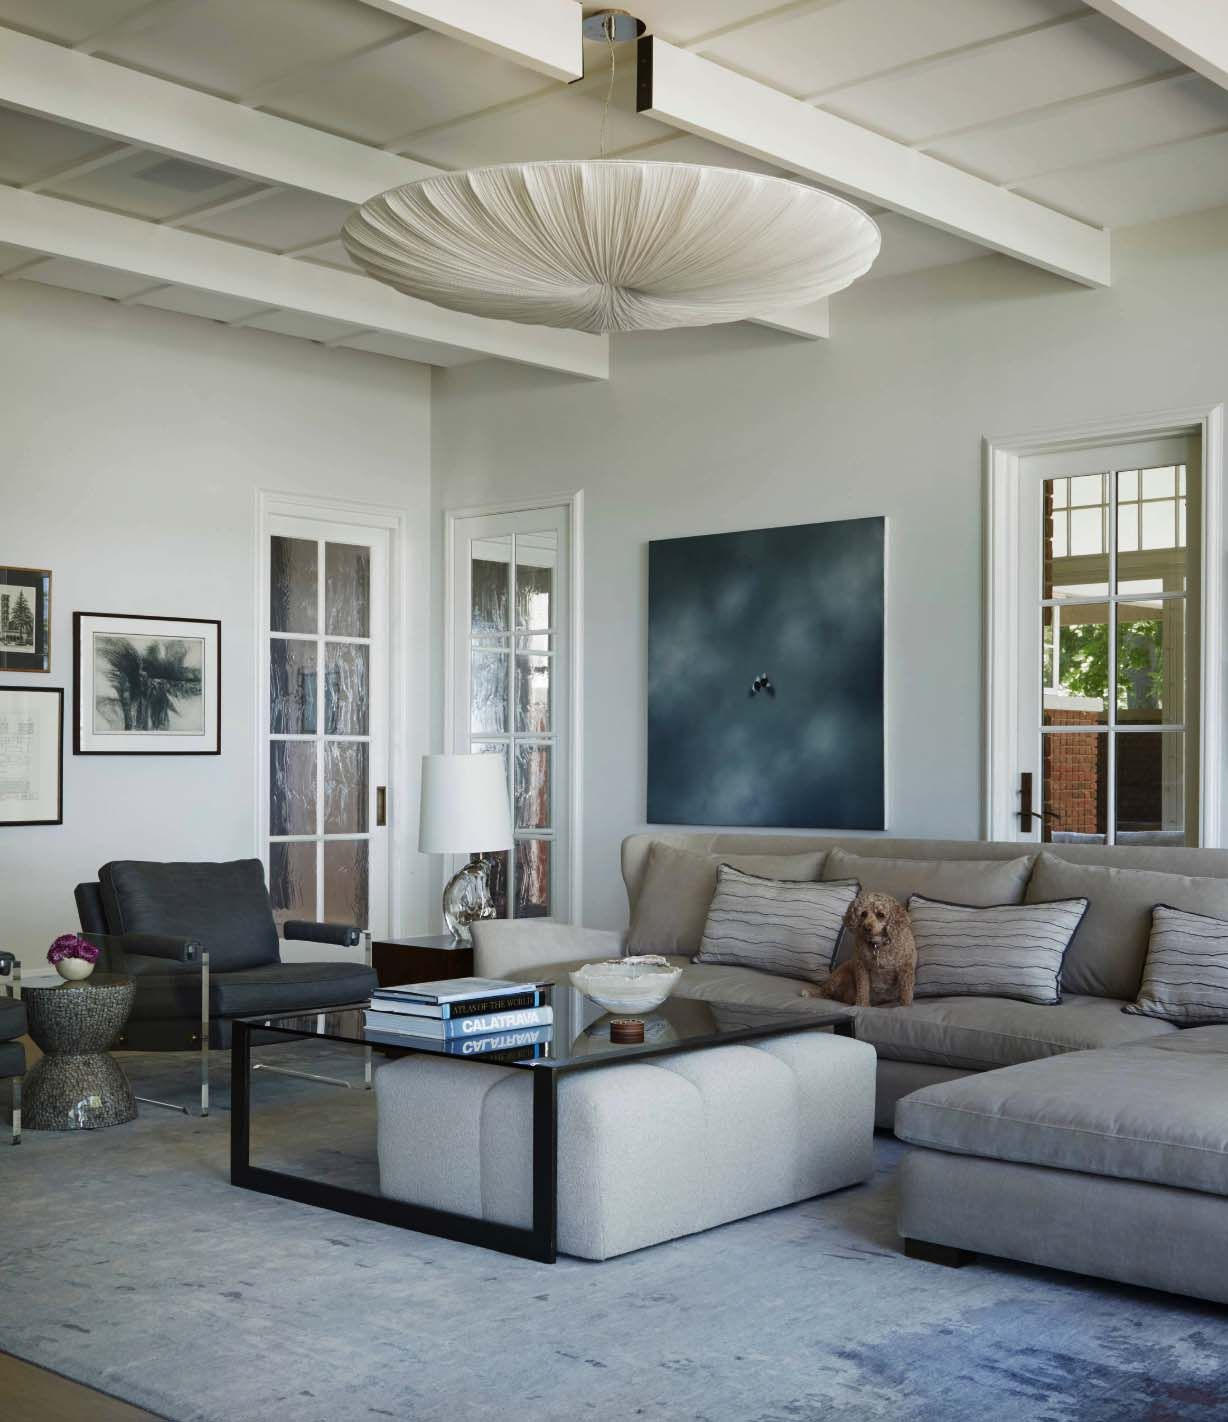 Lake House Living Room Decor: Modern Interpretation Of A Traditional Tudor Style House